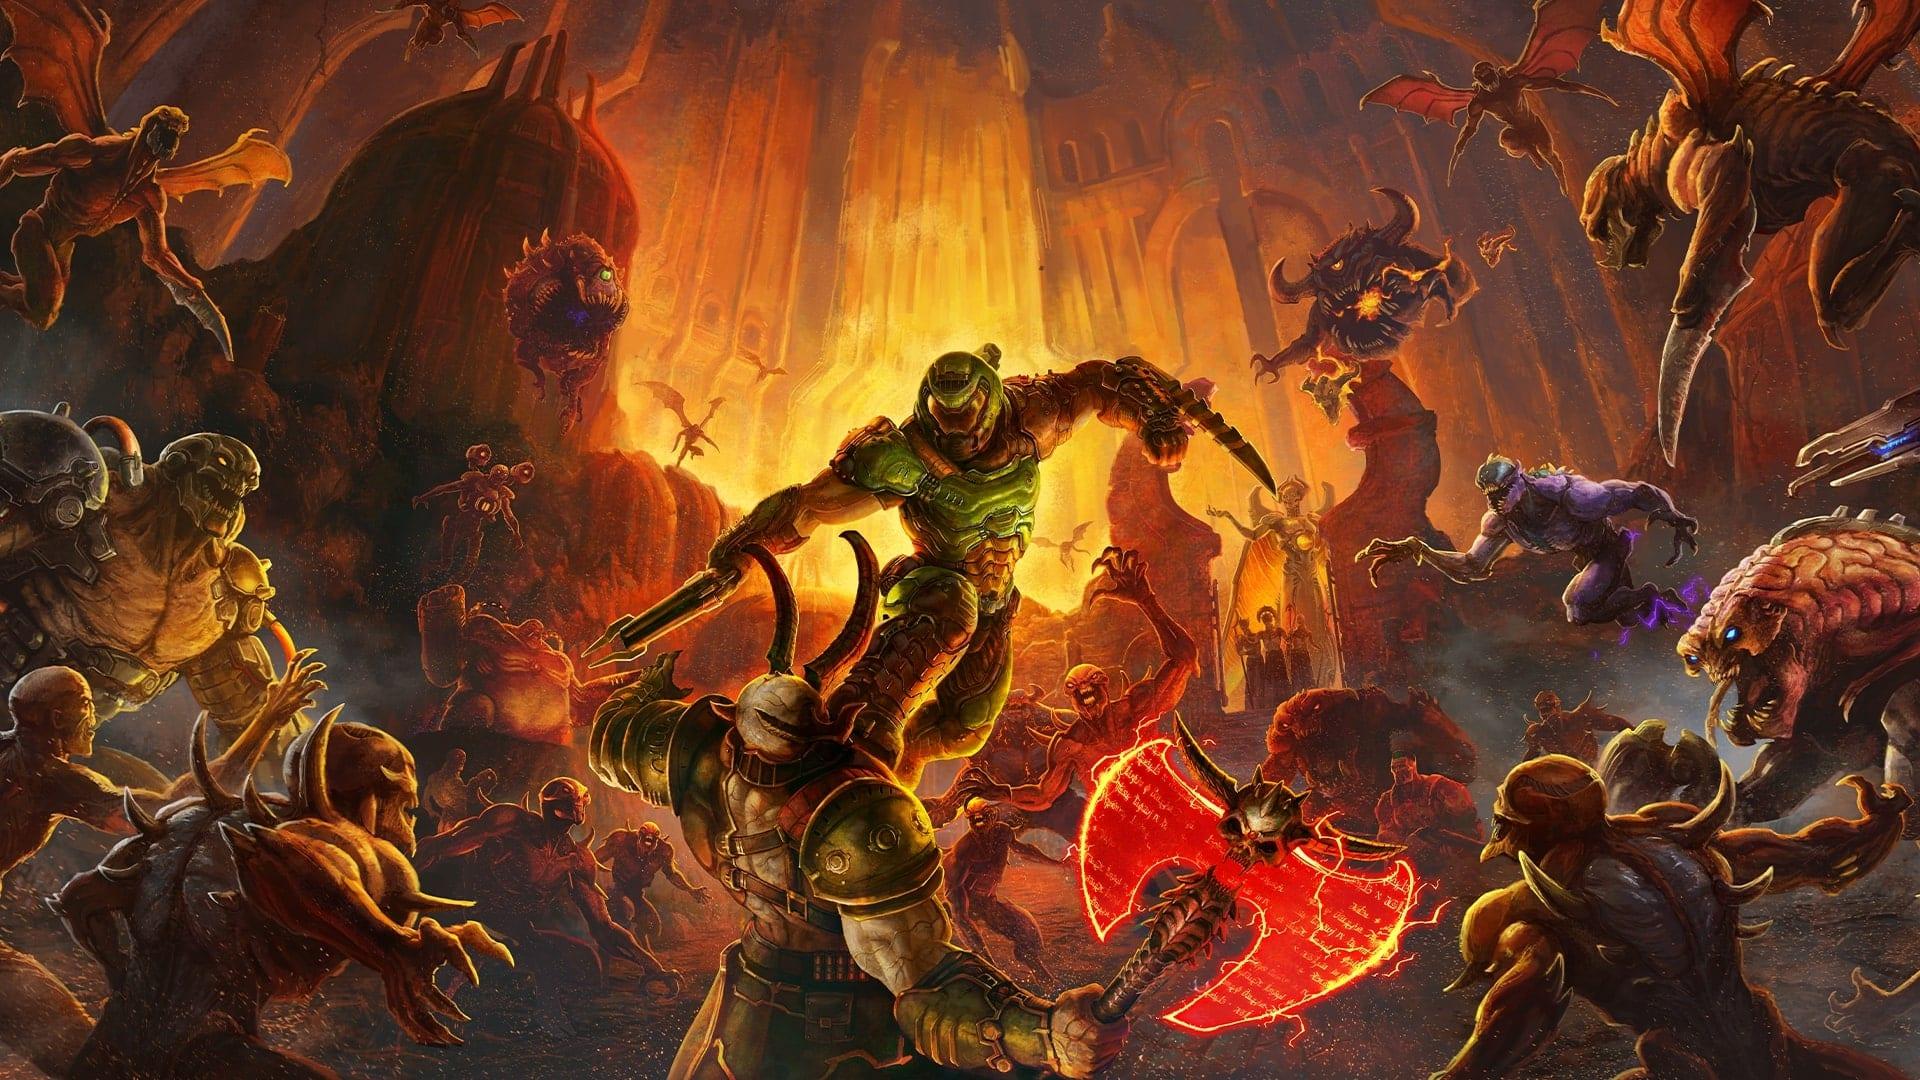 Doom eternal preload and unlock times